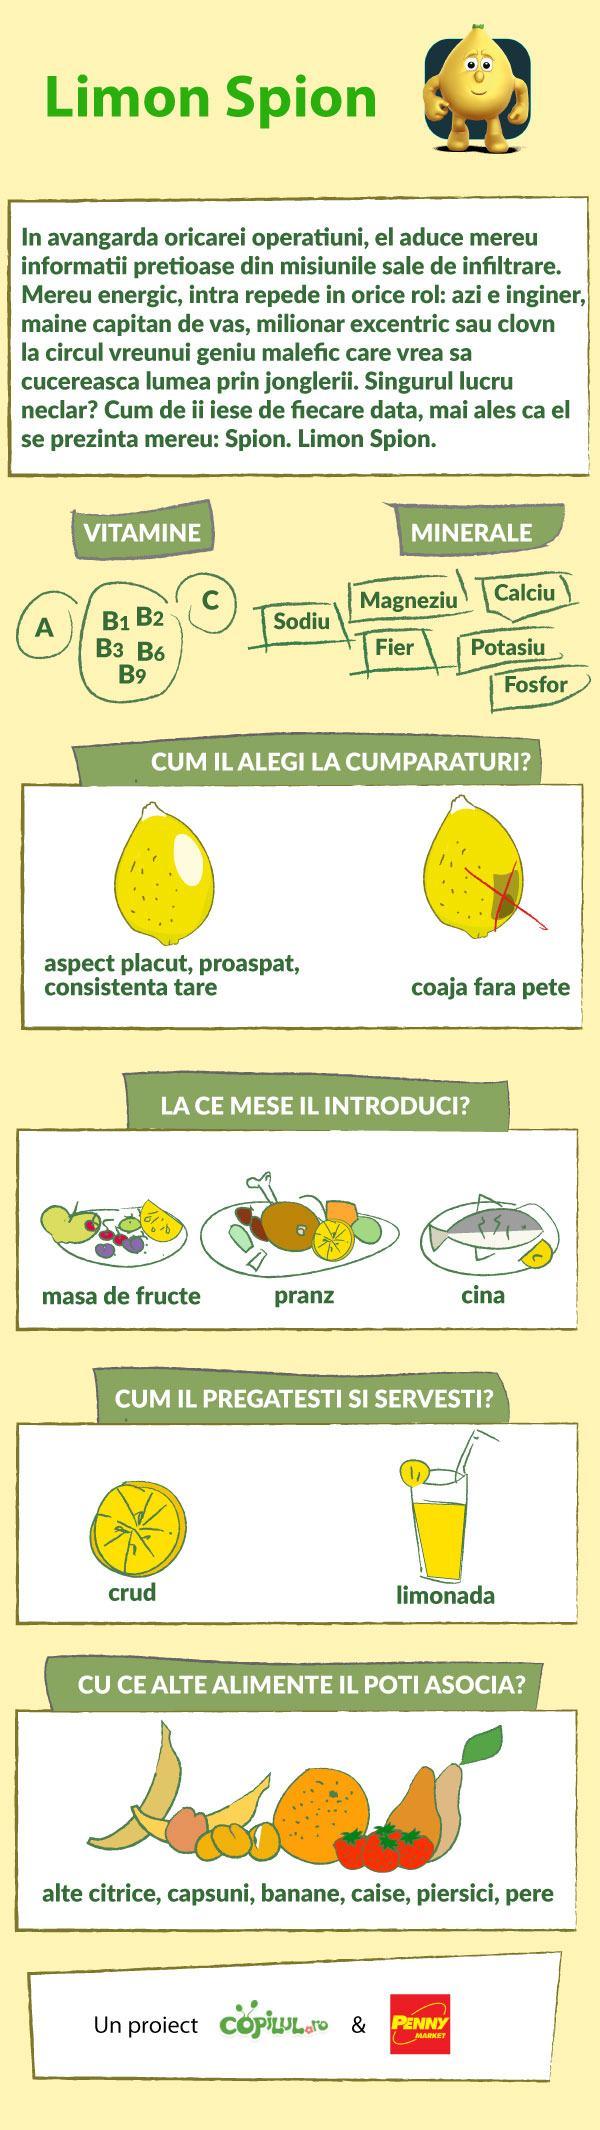 lamaie_infografic_Limon_Spion